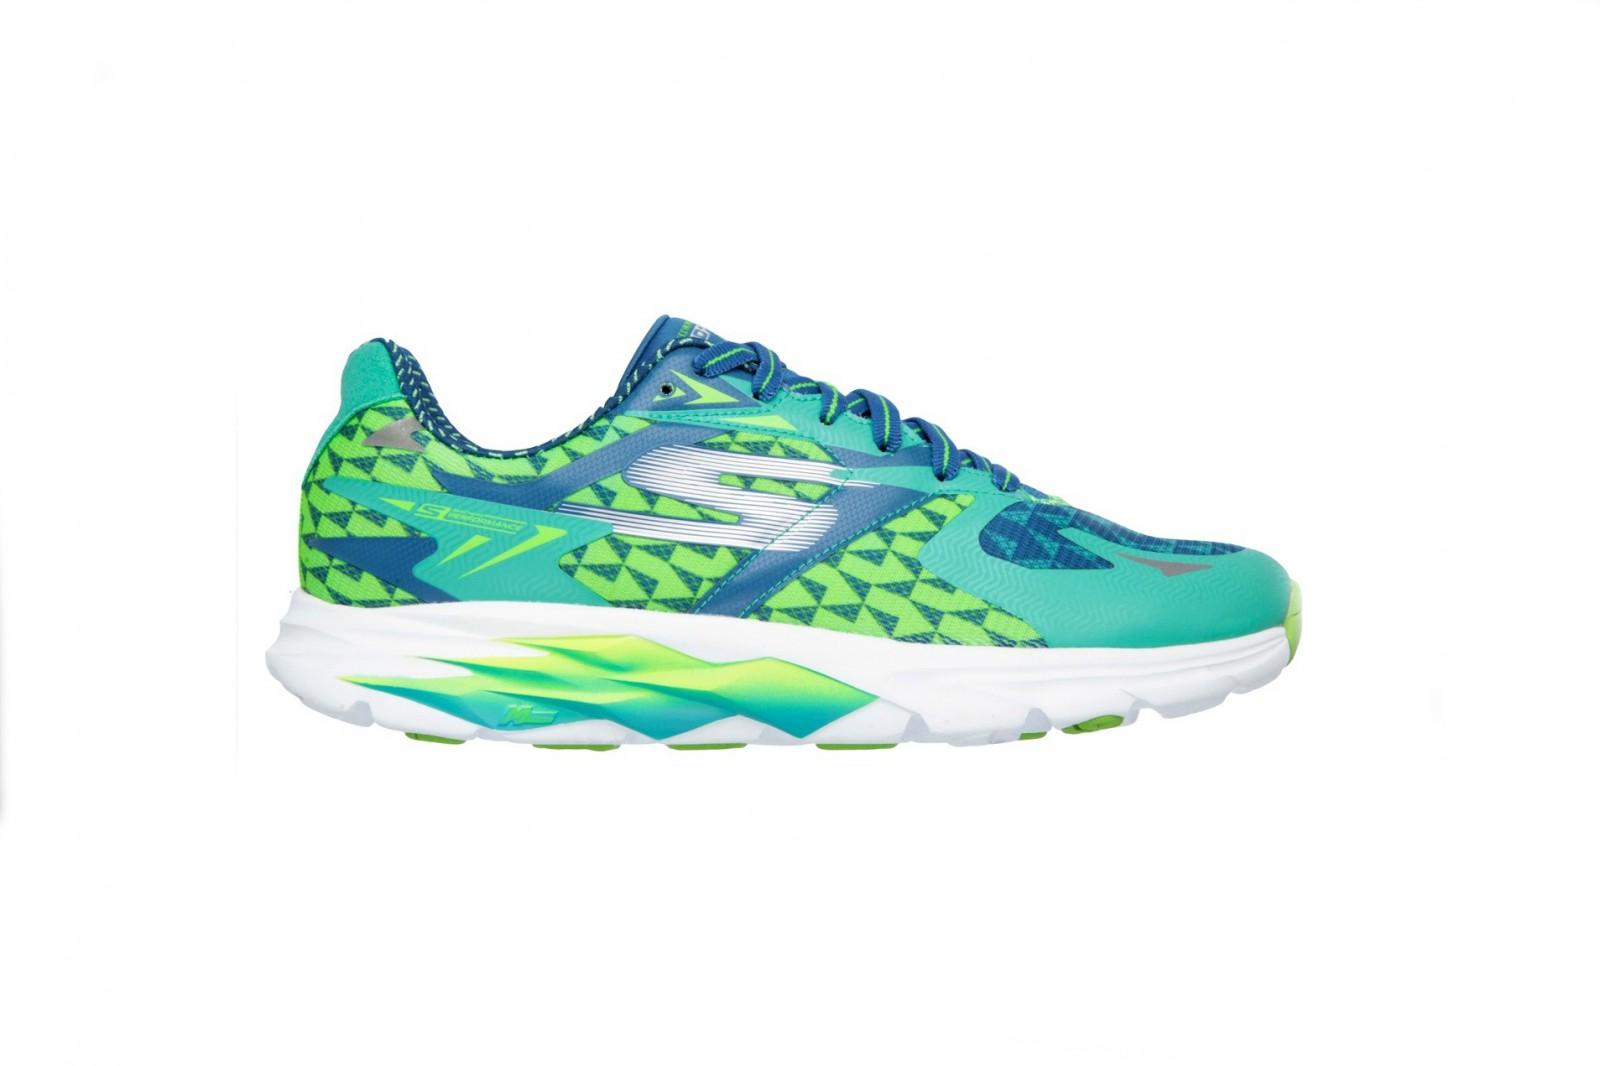 Dámské běžecké boty Skechers GO RUN RIDE 5  edbeb47f4b